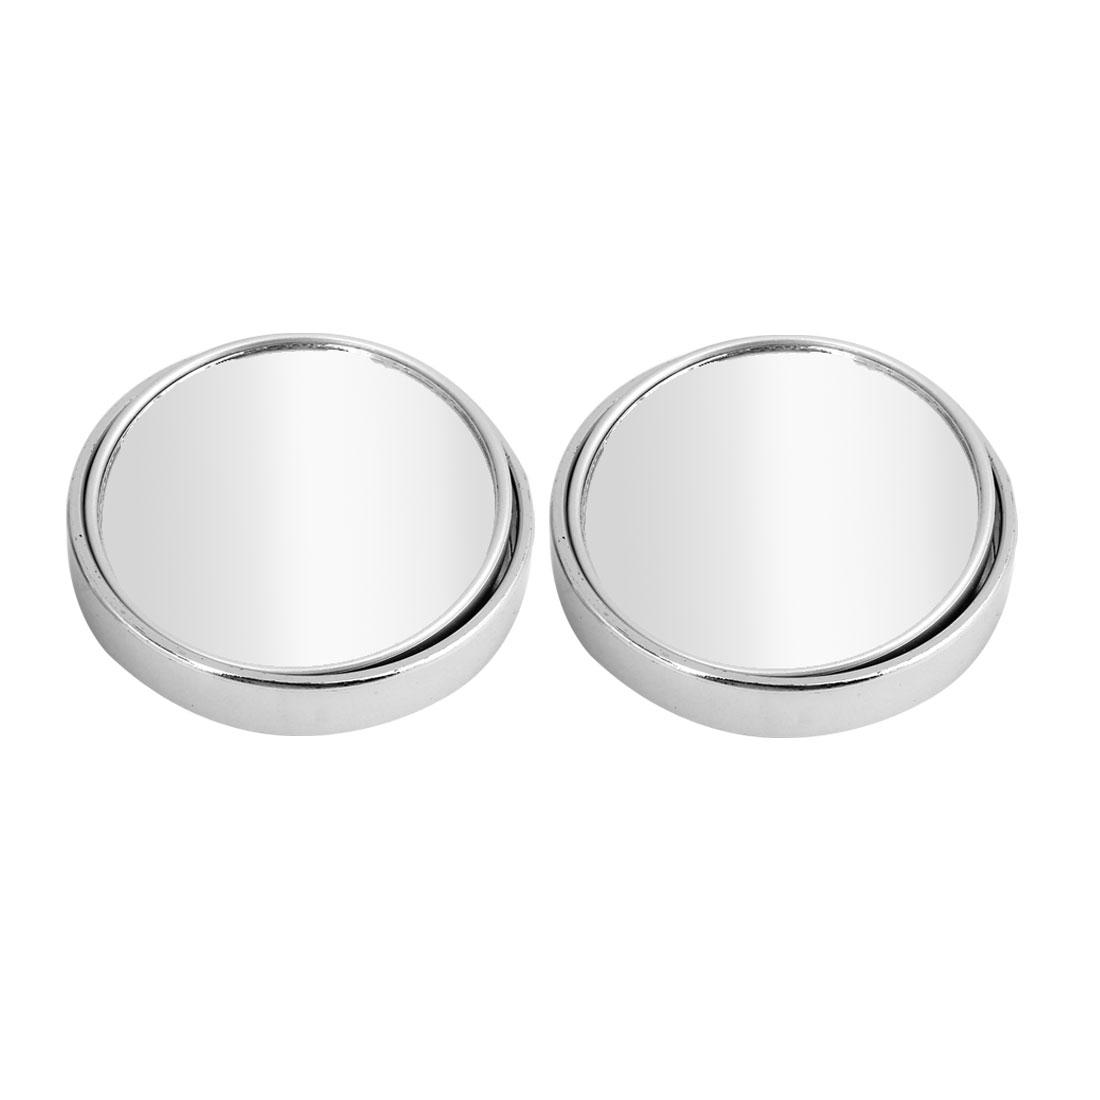 2 Pcs 55cm Dia Adhesive Back Convex Rearmirror Blind Spot Mirror Silver Tone for Car